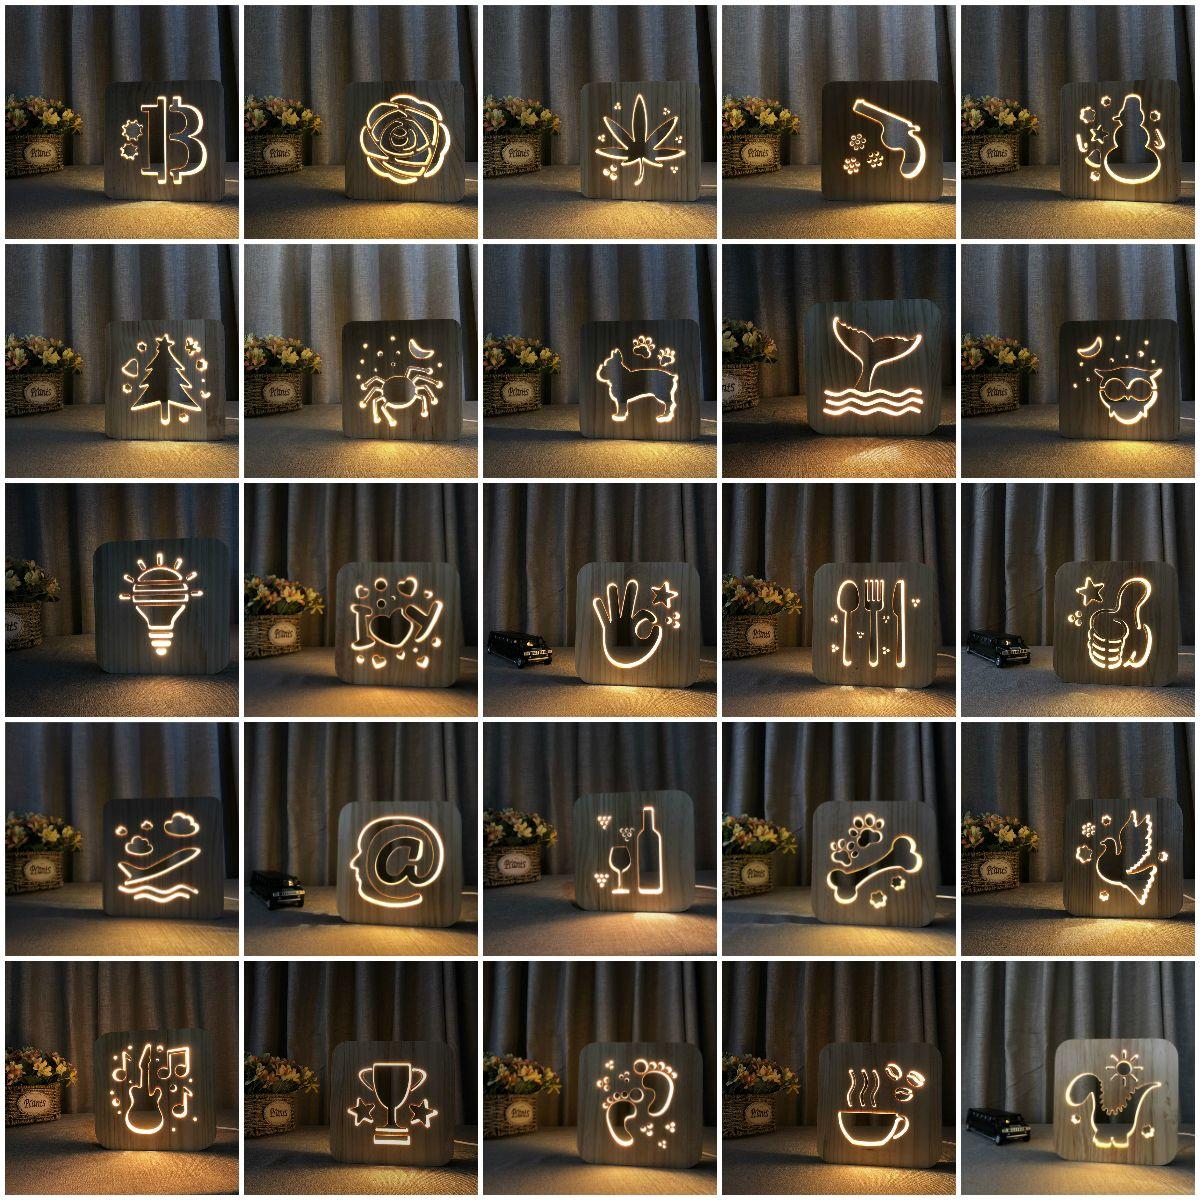 flower LED Table Desk lamp 3D Lamp Cartoon Wooden Nightlight,USB Power Home Bedroom Decoration Lamp 3D Wood Carving Pattern LED NightLight